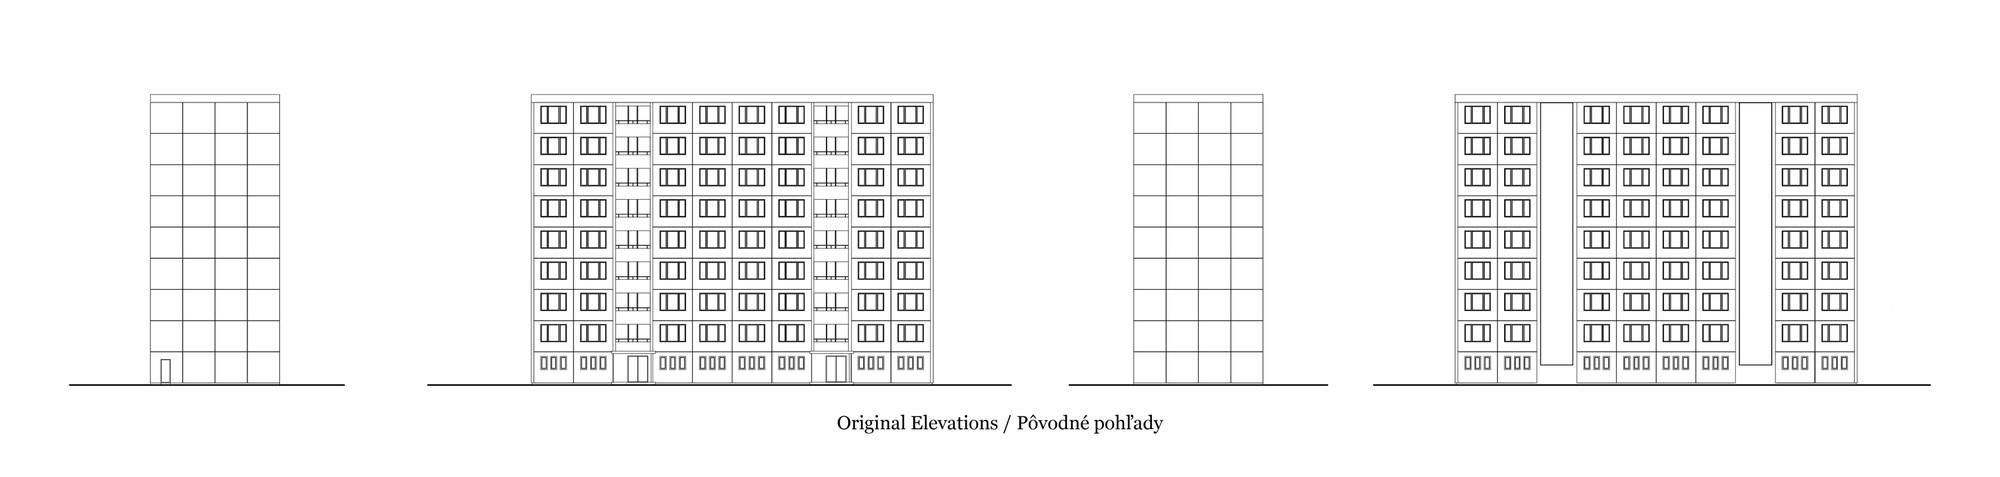 original_elevation